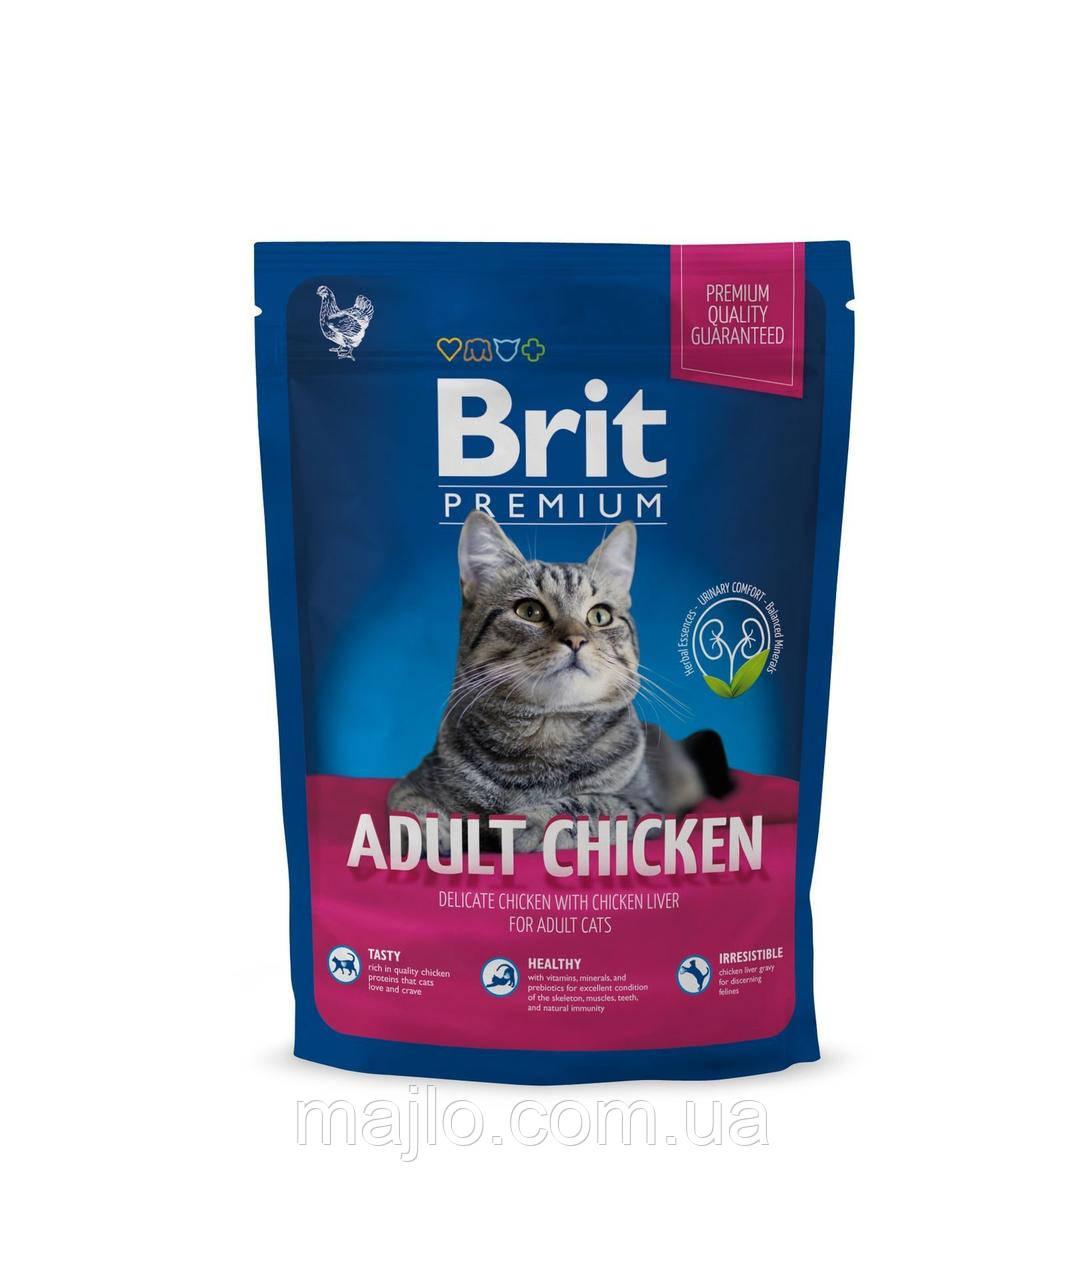 Сухий корм Brit Premium Cat Adult Chicken Брит Преміум для дорослих кішок, 800 г, 170356